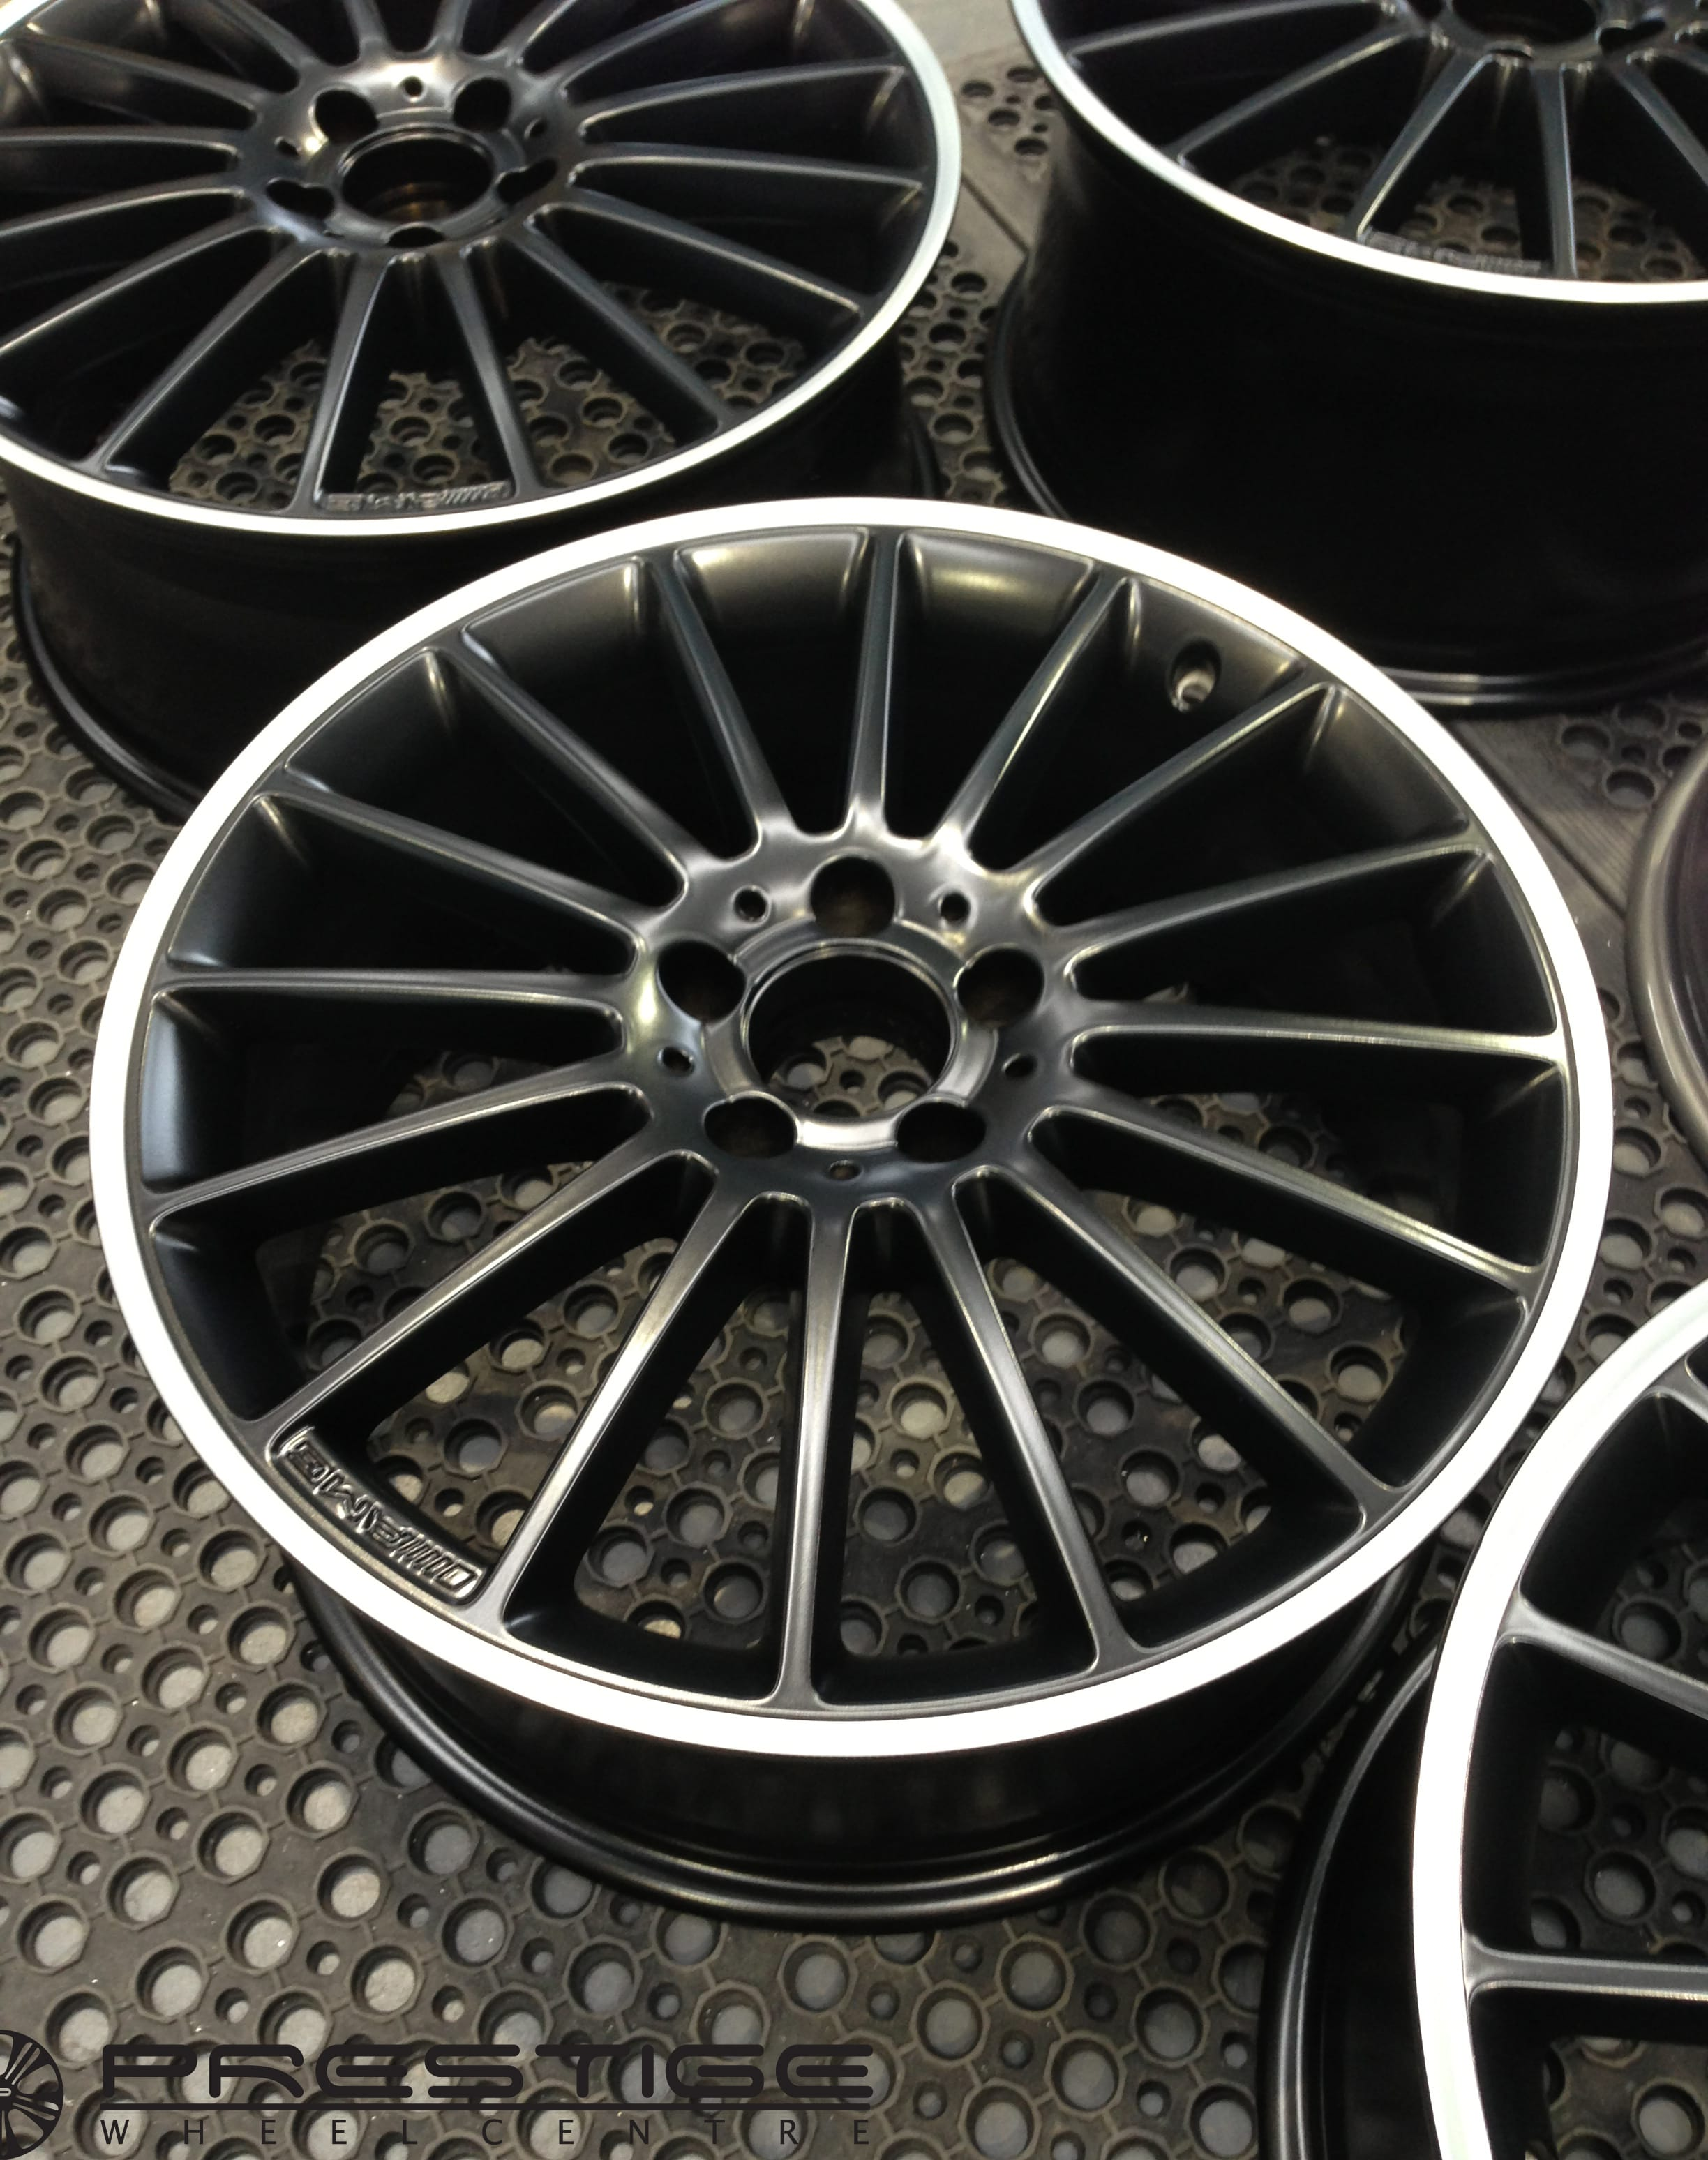 Mercedes C63 Amg Wheels Re Finished Refurbished Amp Diamond